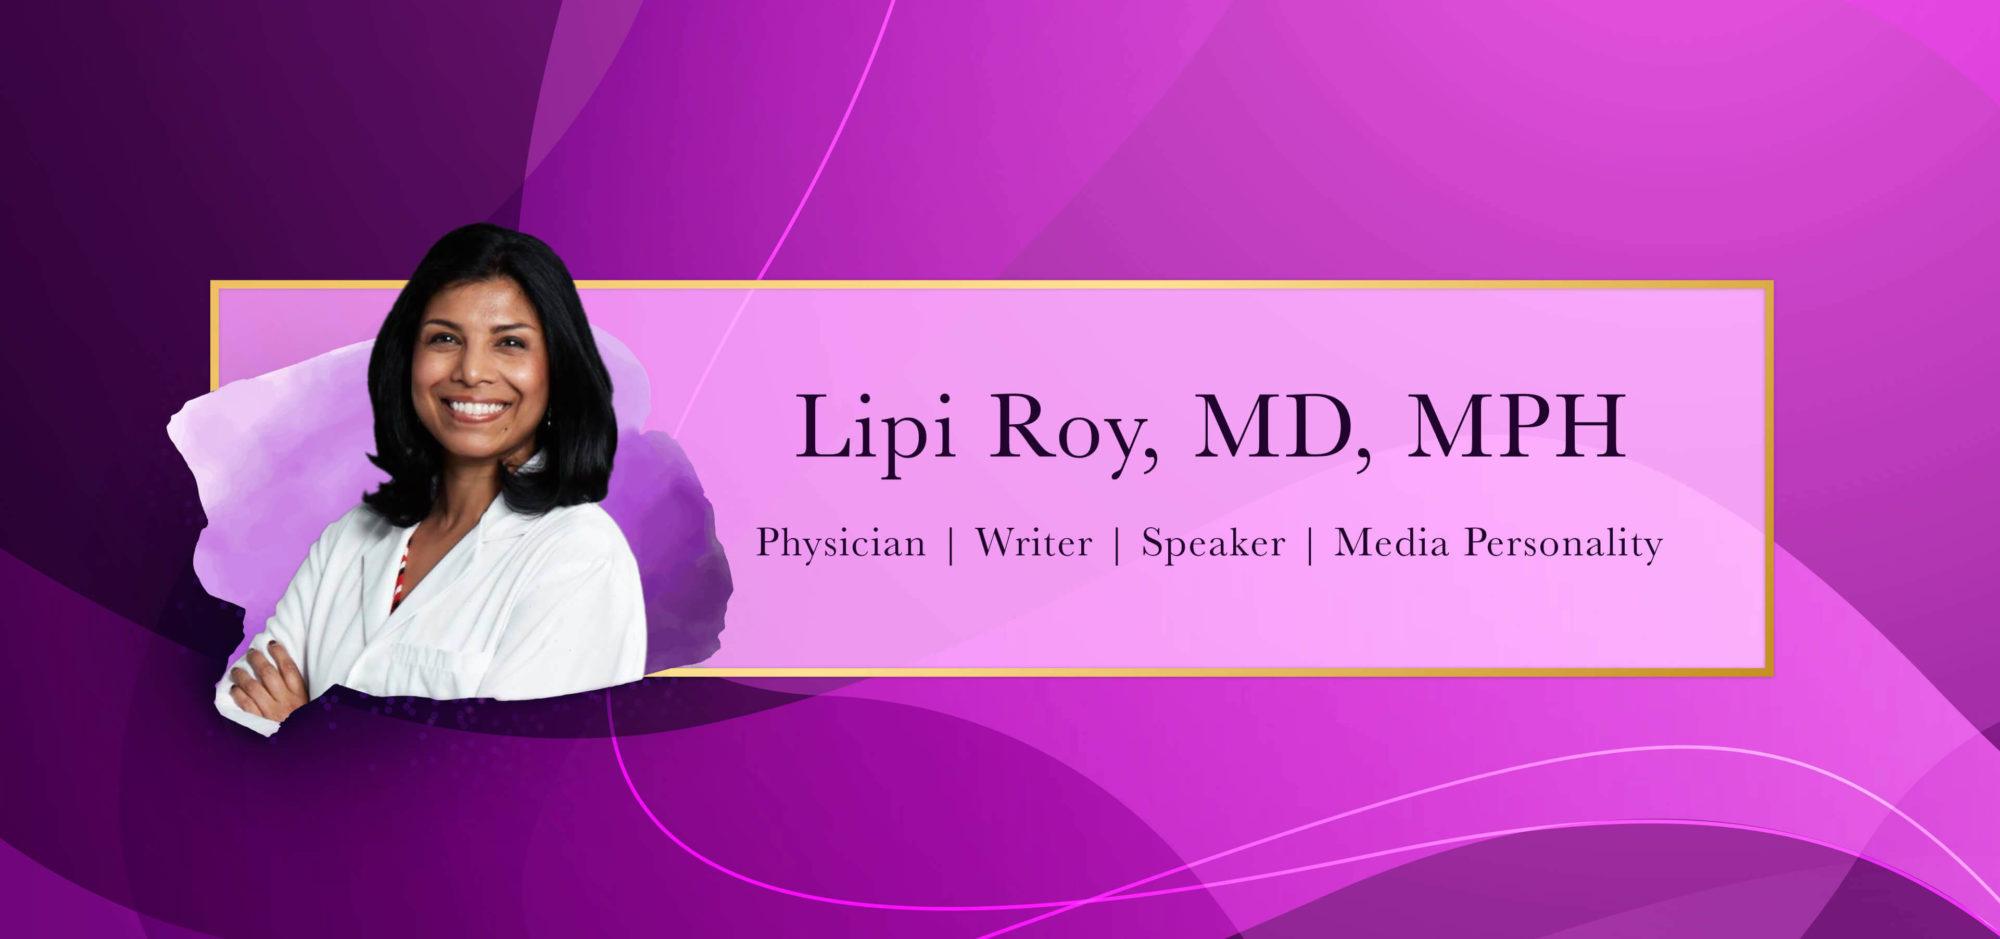 Lipi Roy, MD, MPH